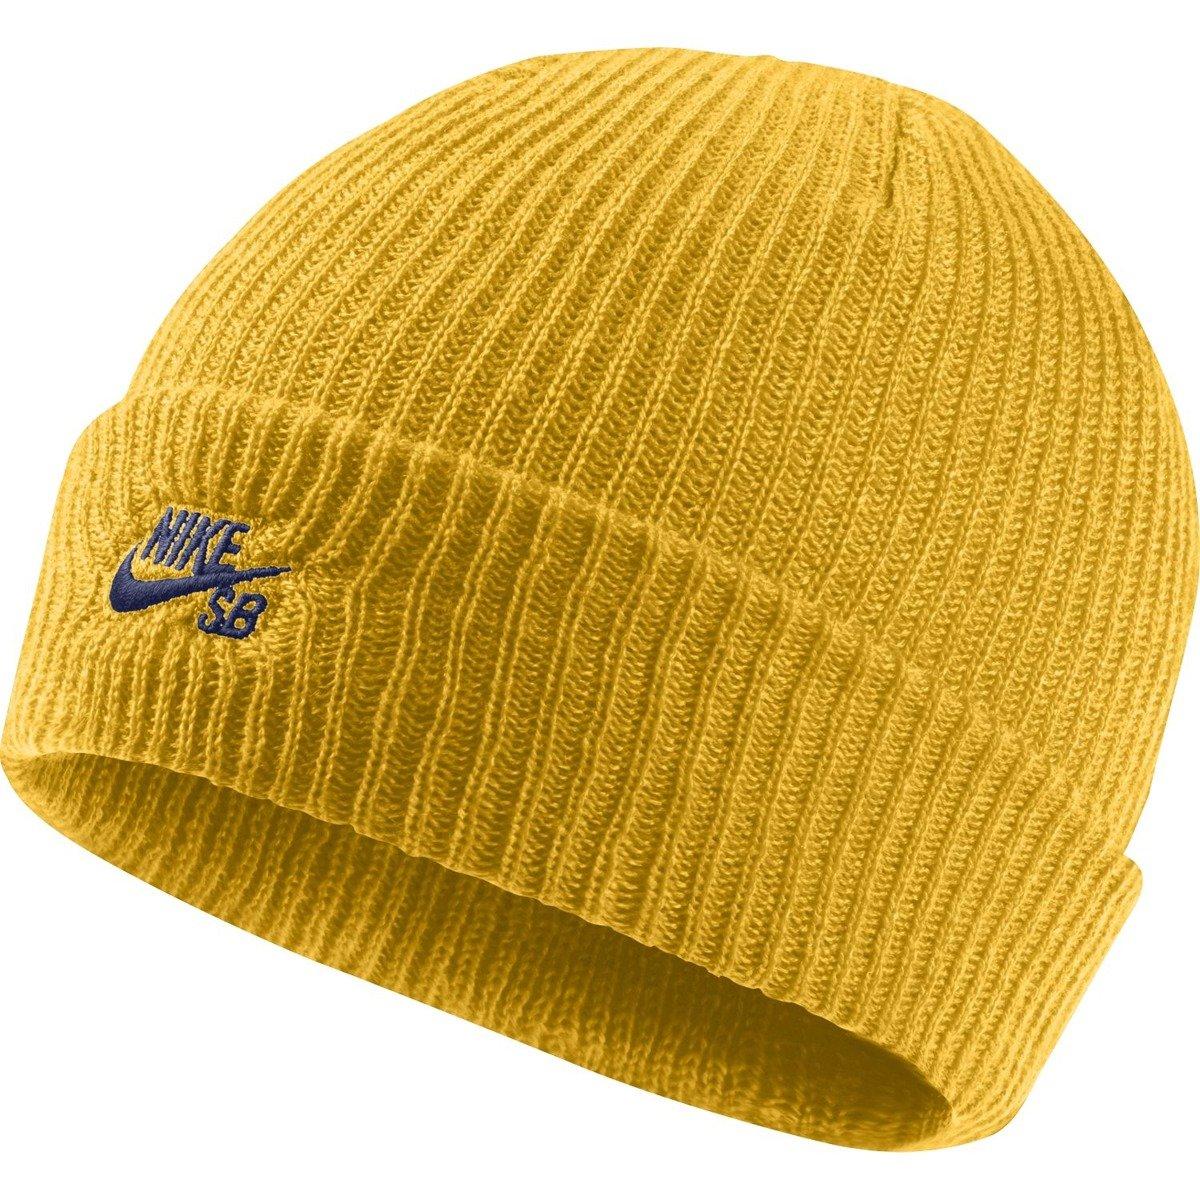 sports shoes c5625 c0fe4 nike sb fisherman beanie yellow ochre blue void yellow   Clothes   Cap   Beanie  Brands   Nike SB Produkt Na Prezent Odzież   Nike SB   Nike SB Fall 2018 ...